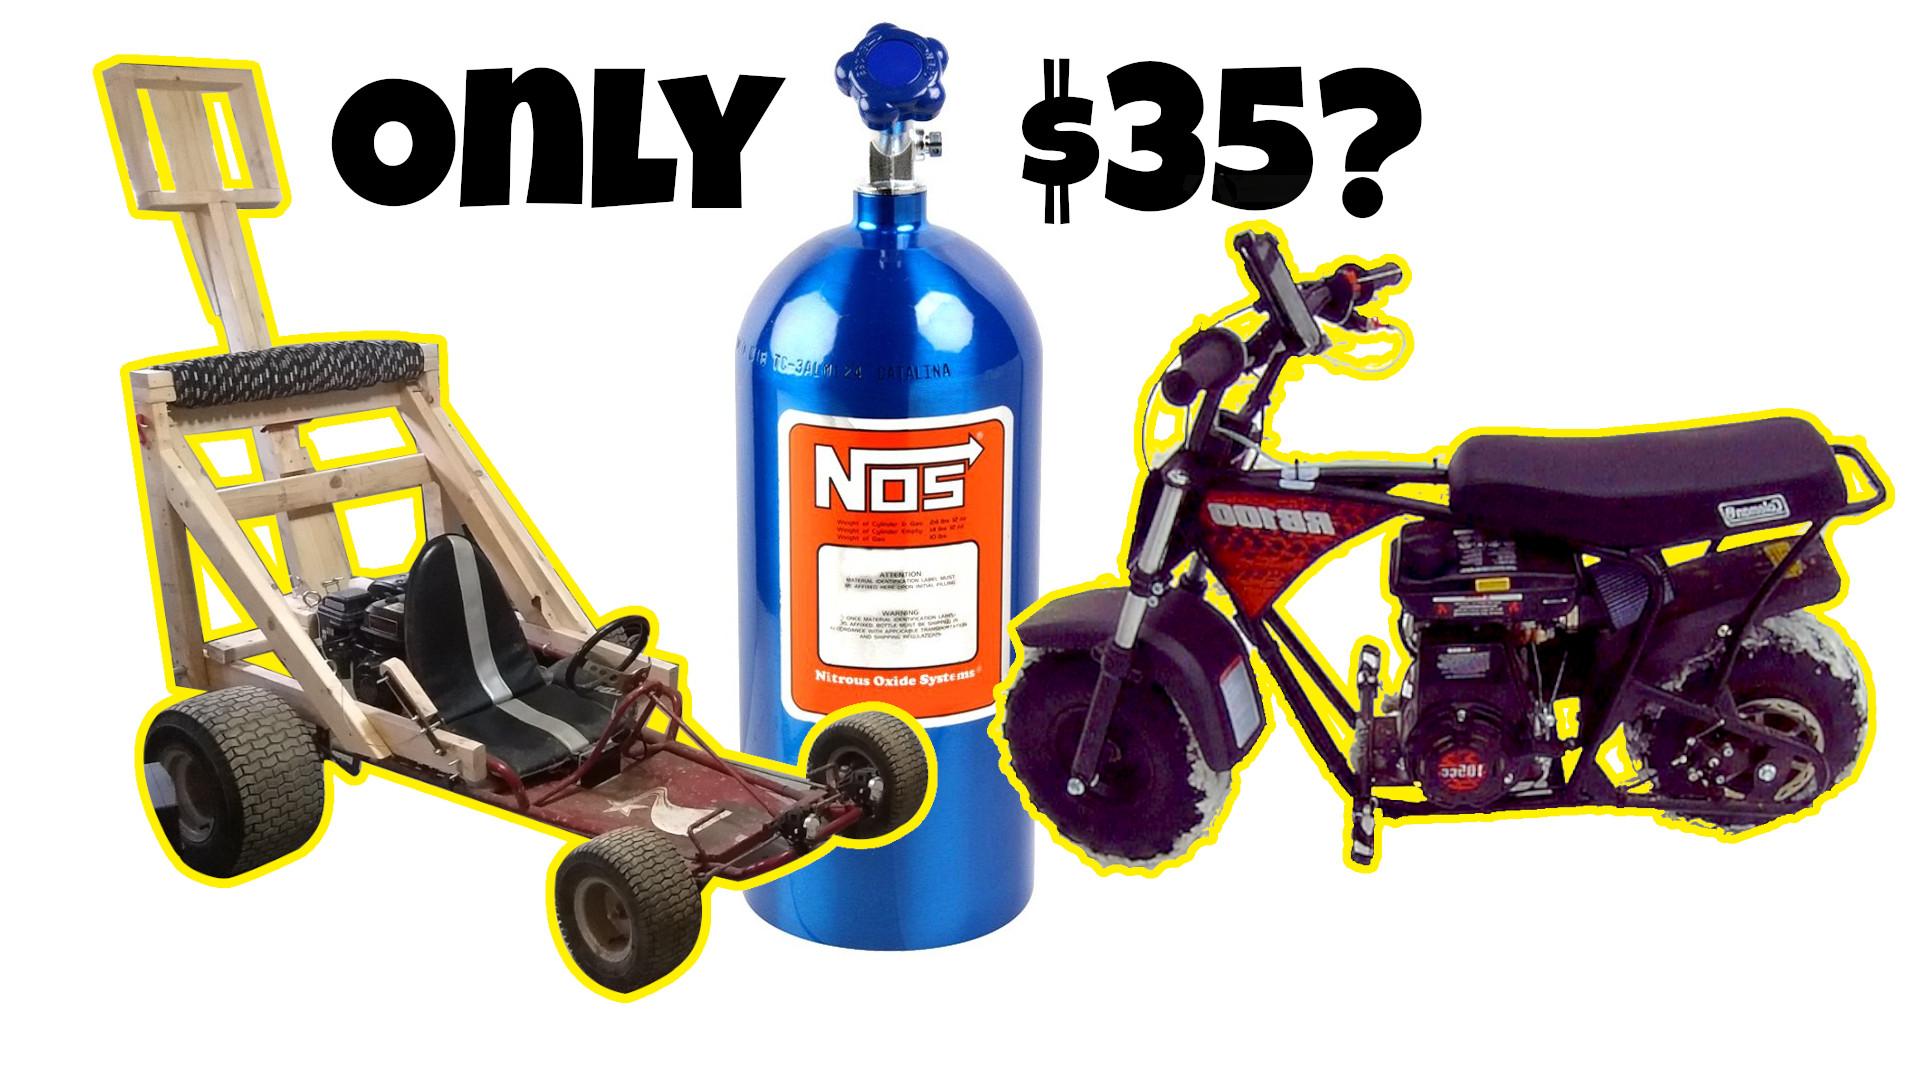 Mini Bike and Go Kart NITROUS OXIDE Kit (NOS)